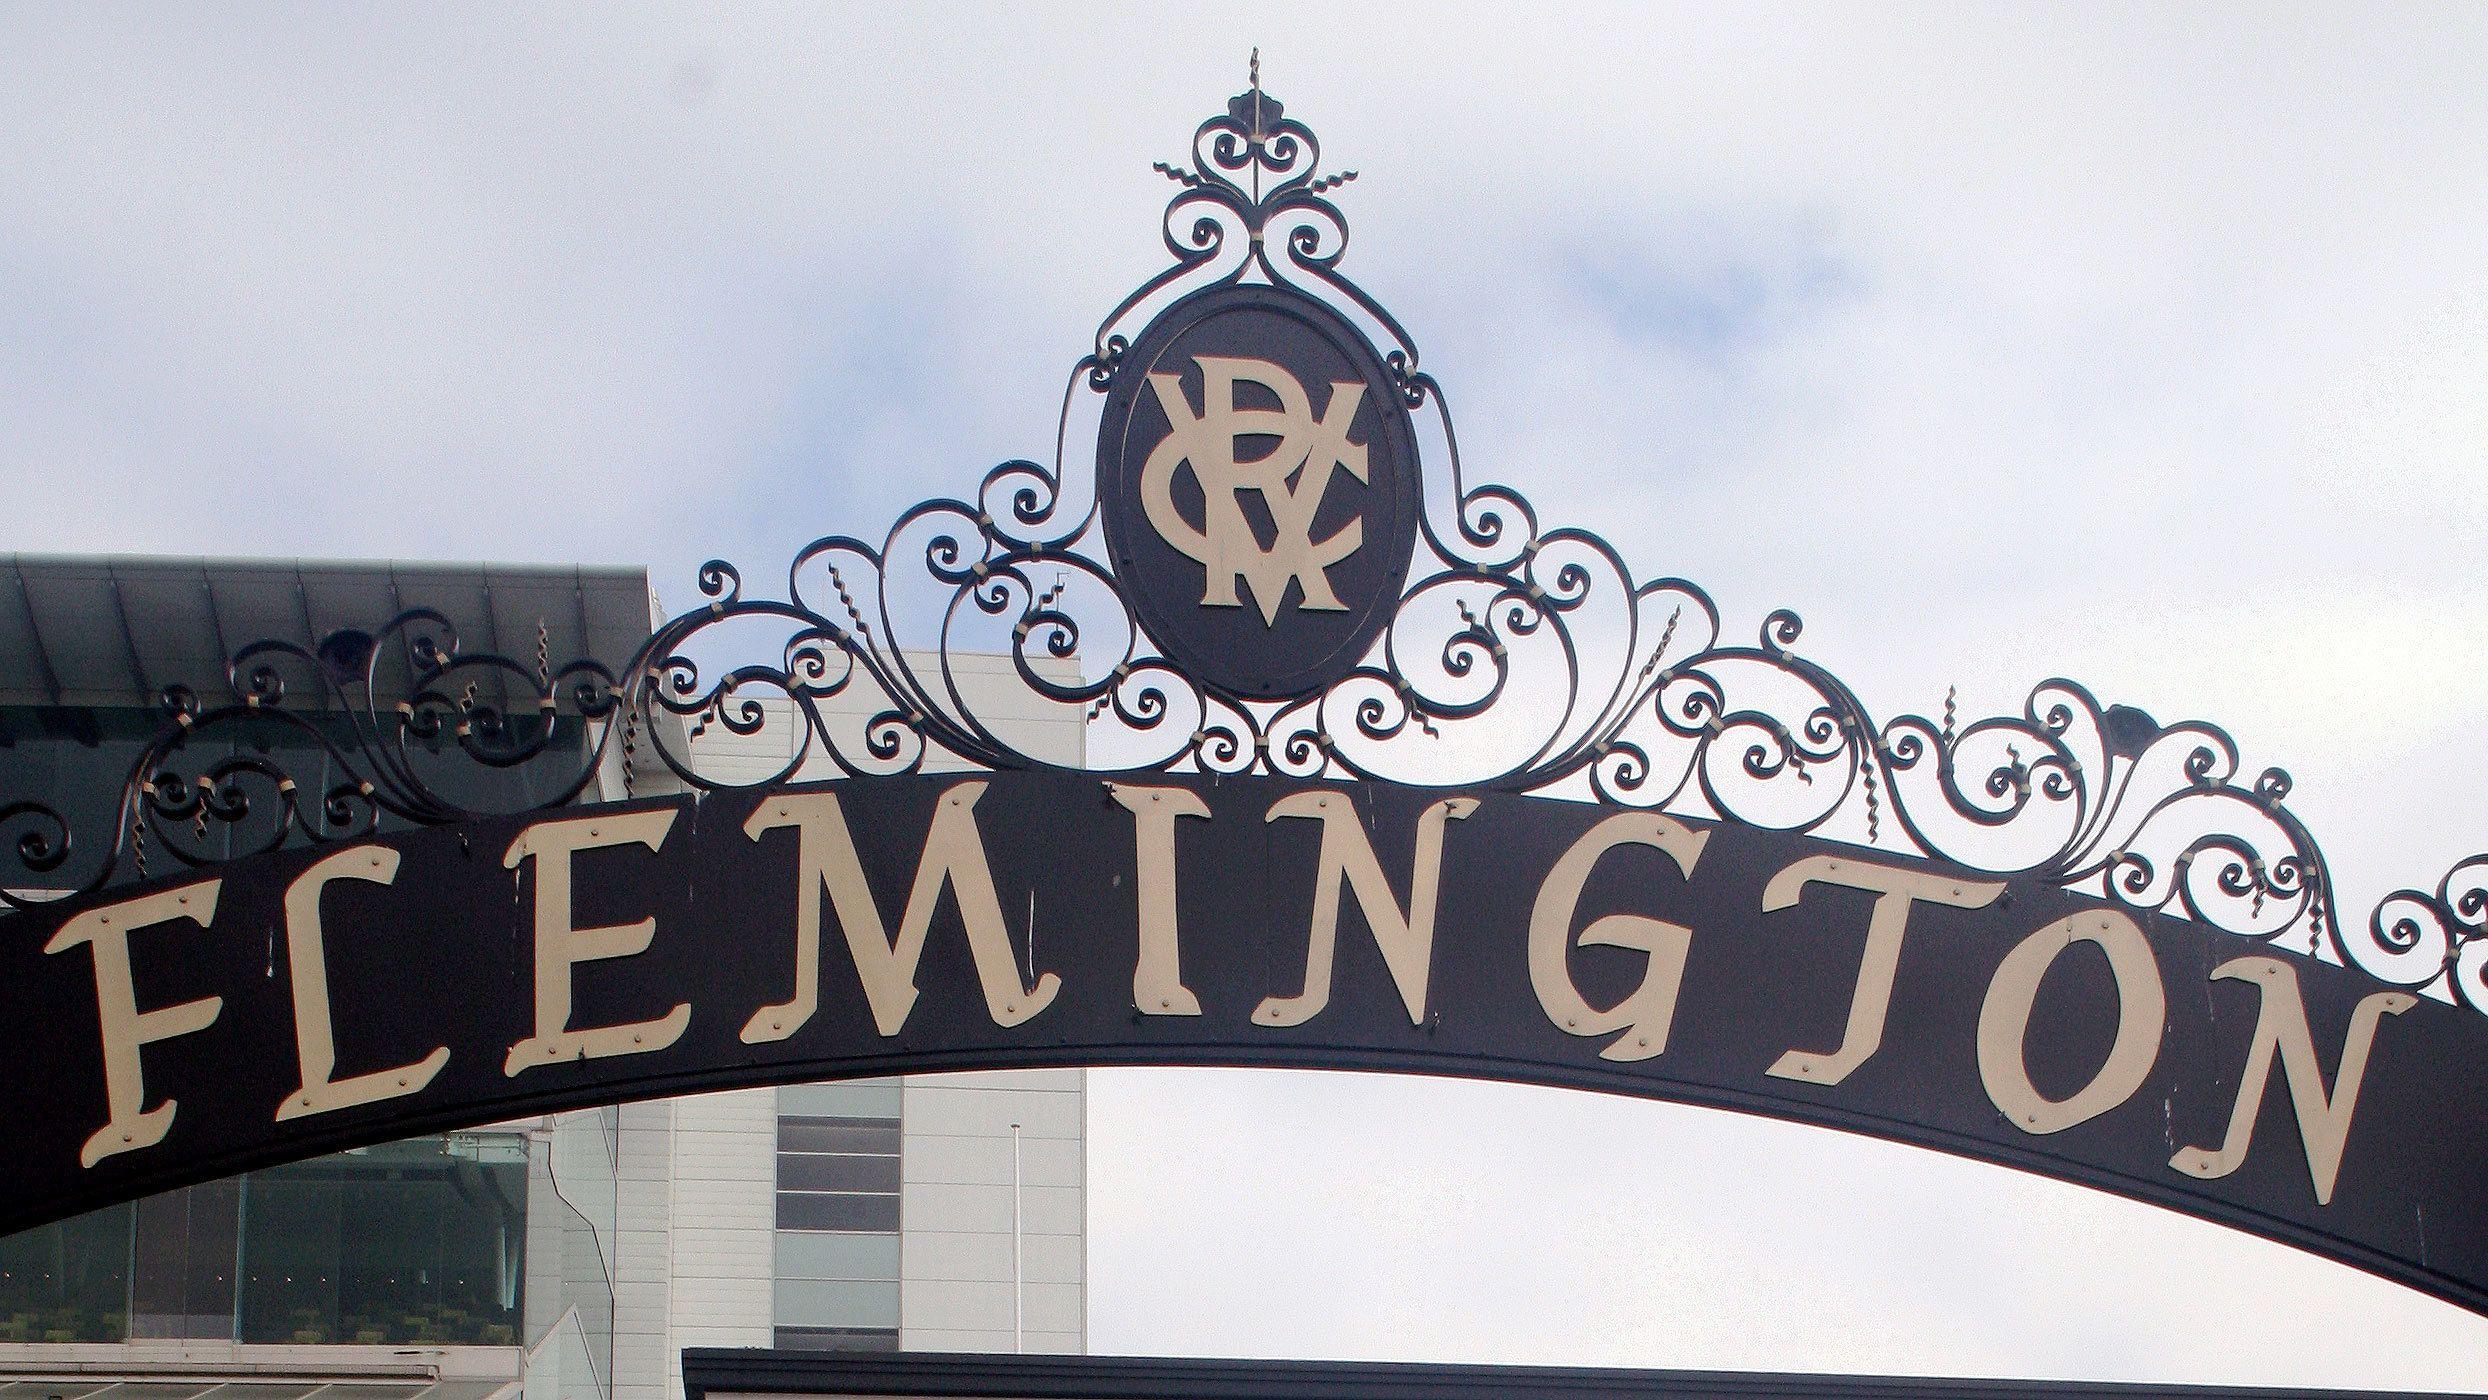 Flemington entrance gate in Melbourne